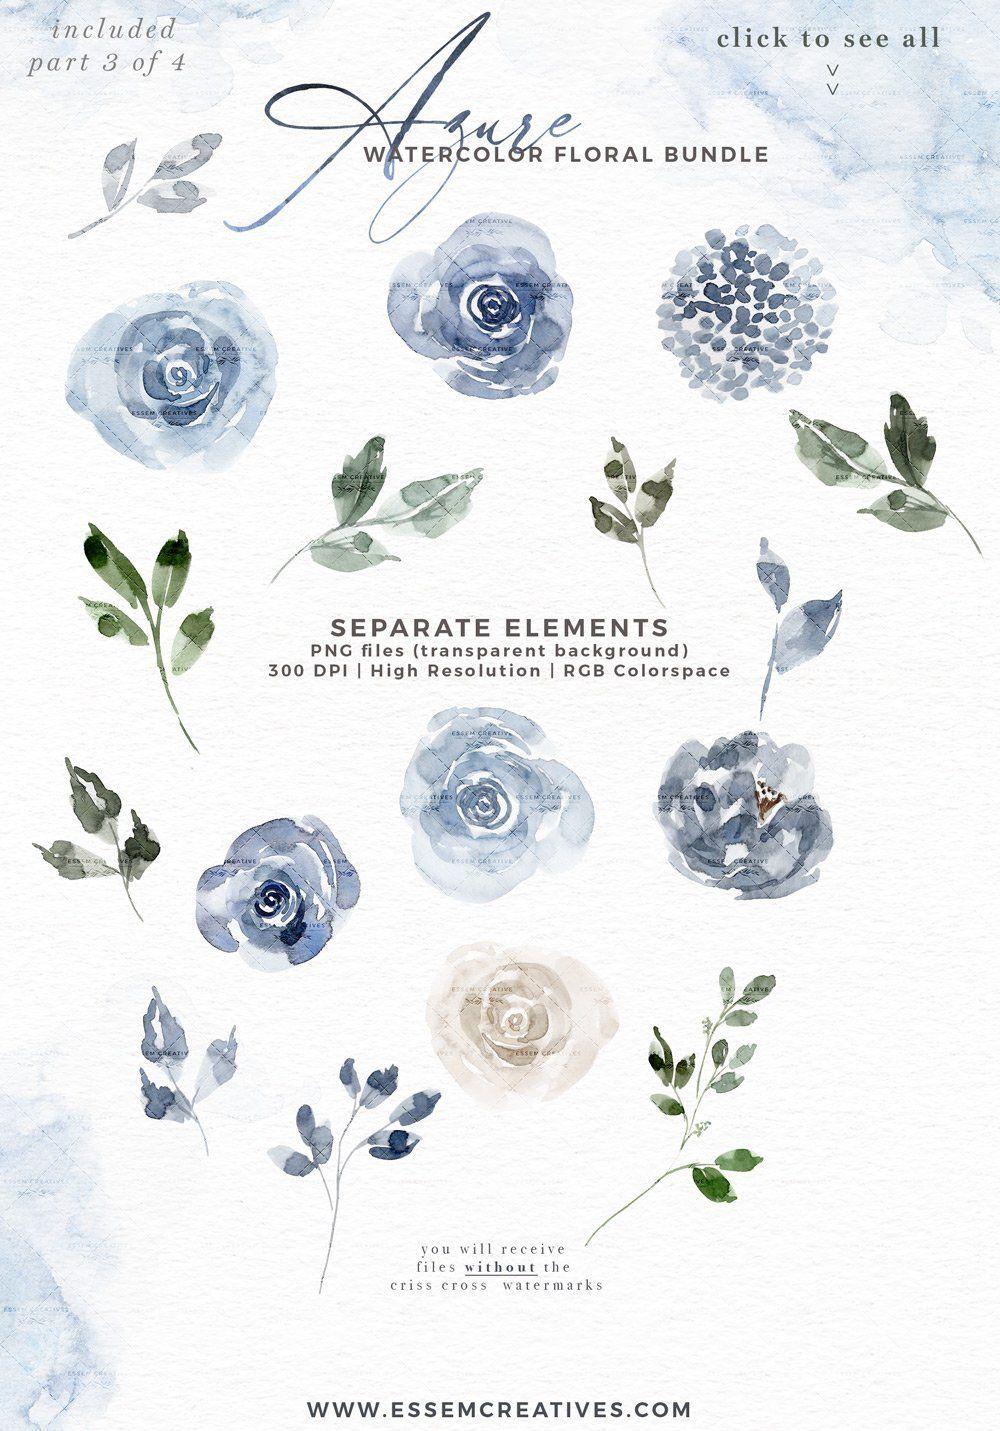 Azure Blue Watercolor Flowers Clipart Pale Dusty Blue Graphics Background Card Borders Templates Essem Creatives Watercolor Clipart Business Branding